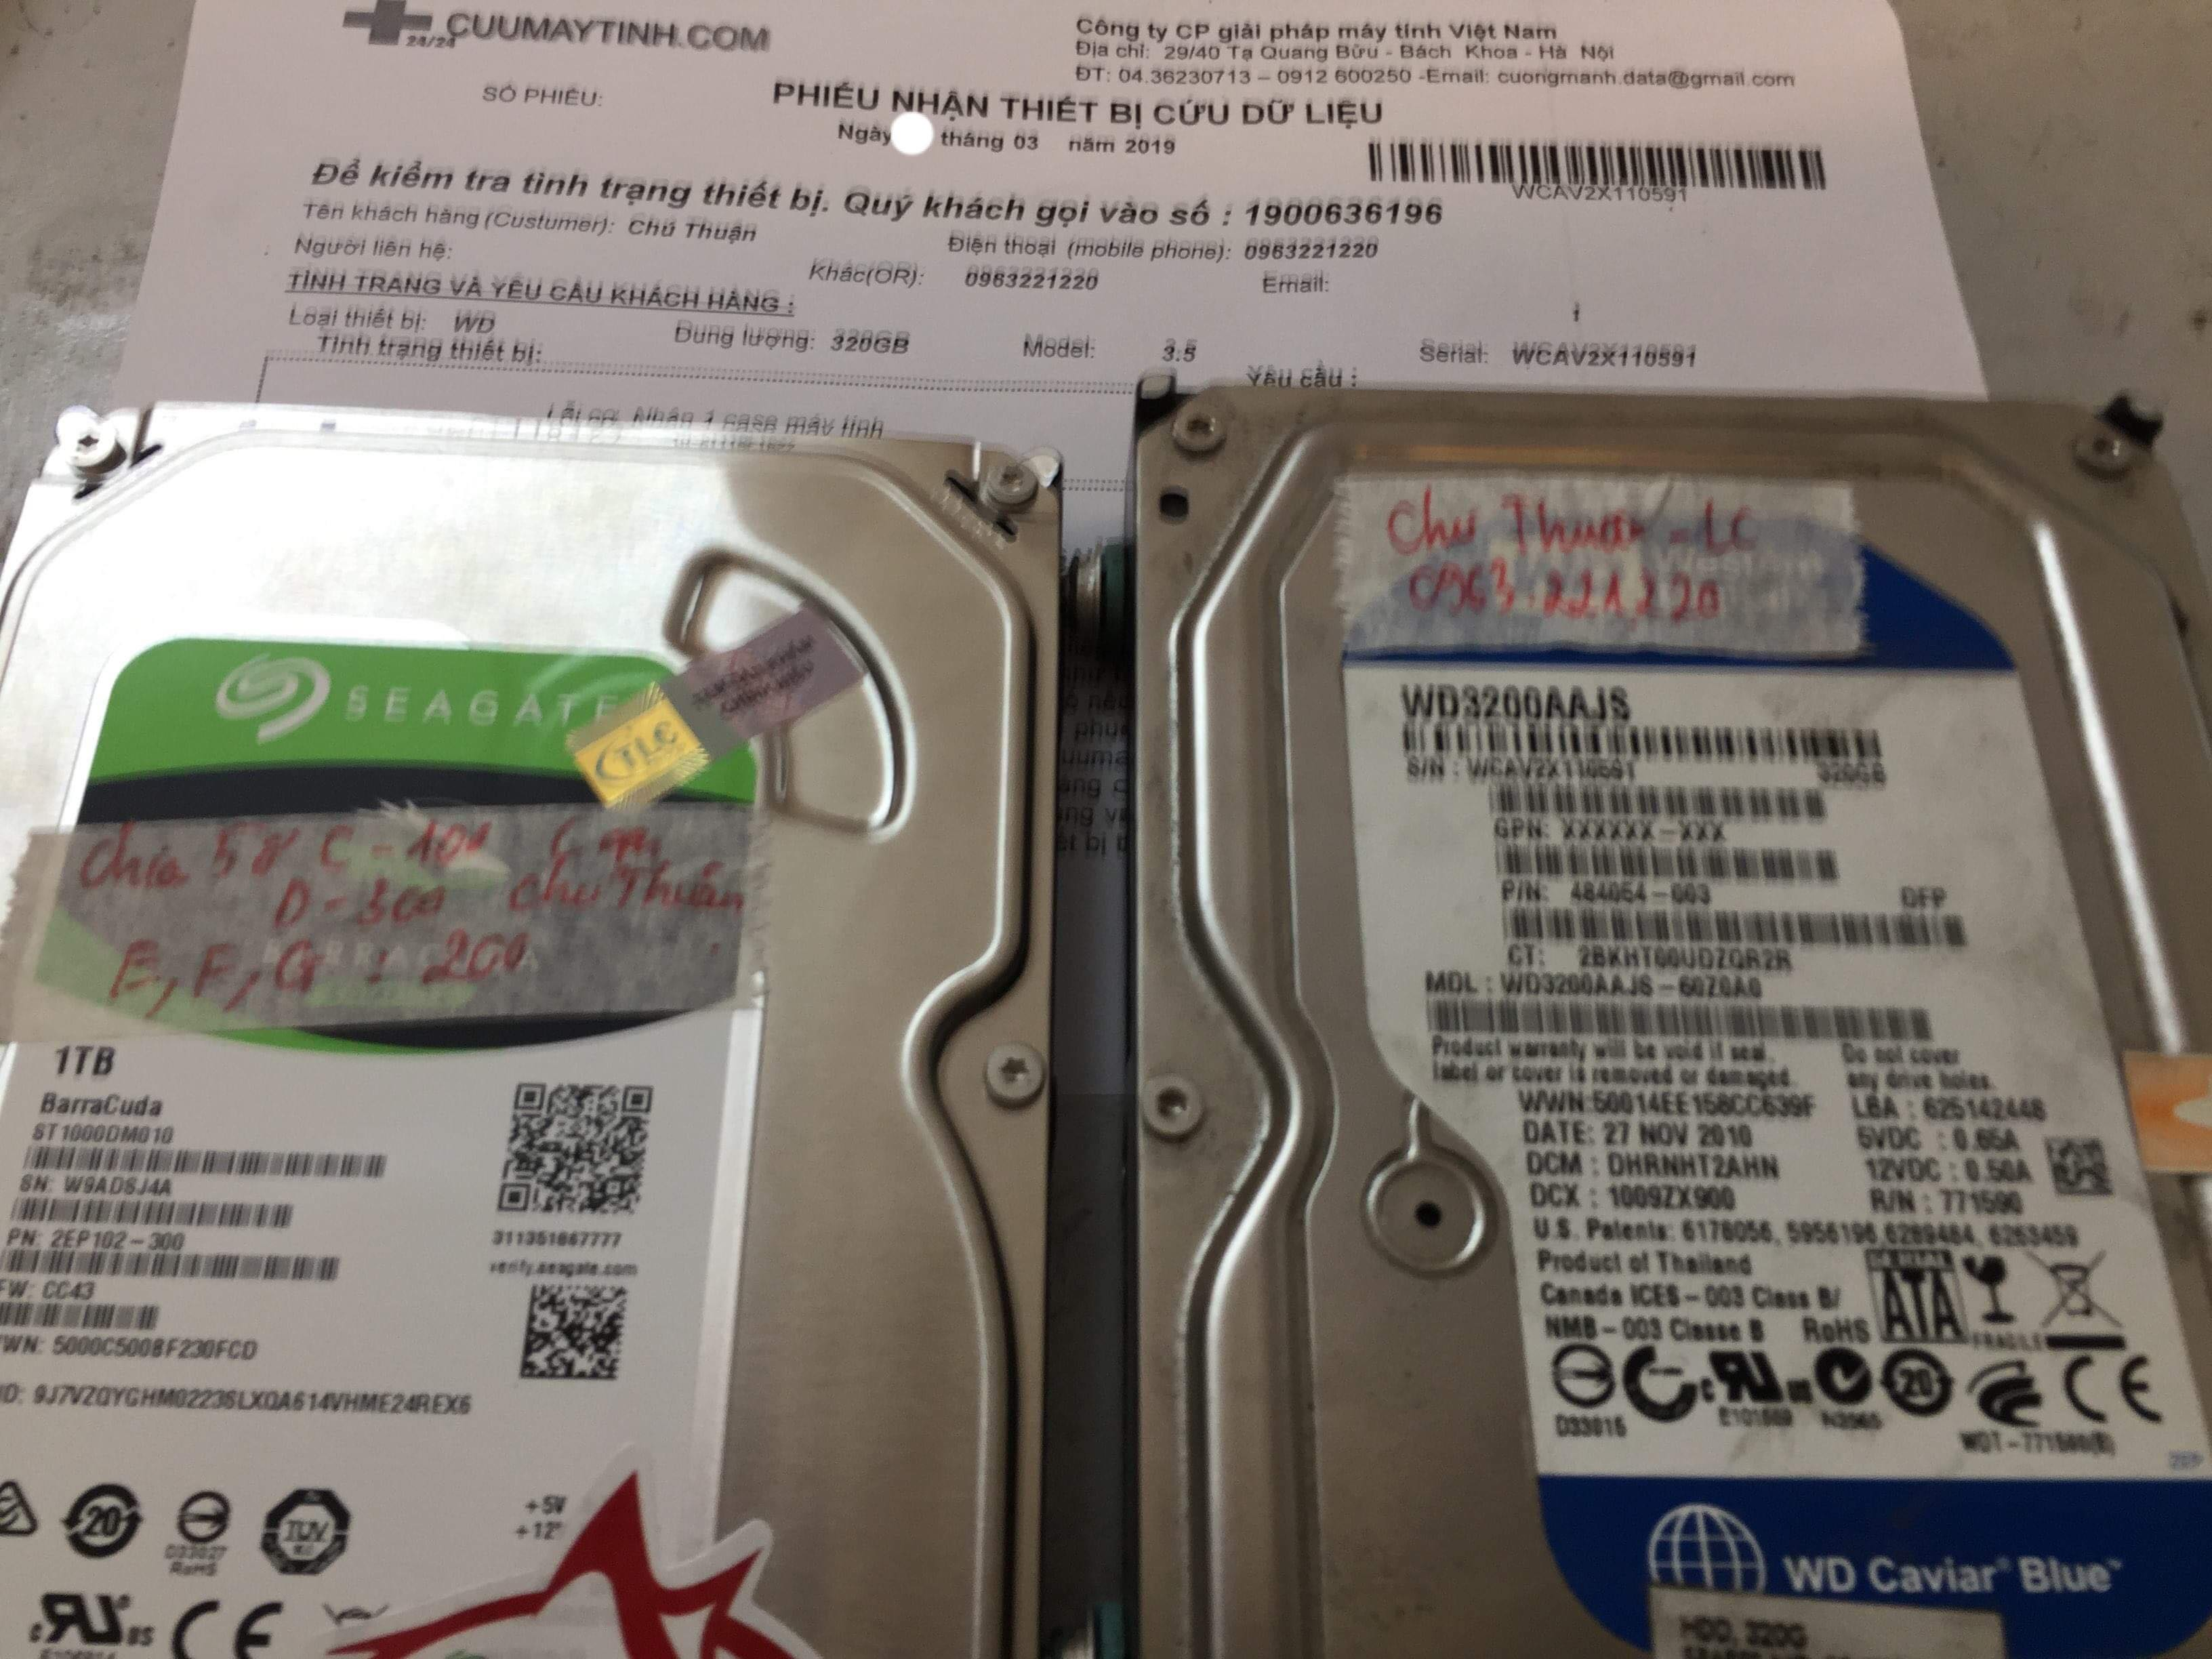 Cứu dữ liệu ổ cứng Western 320GB lỗi cơ 05/03/2019 - cuumaytinh